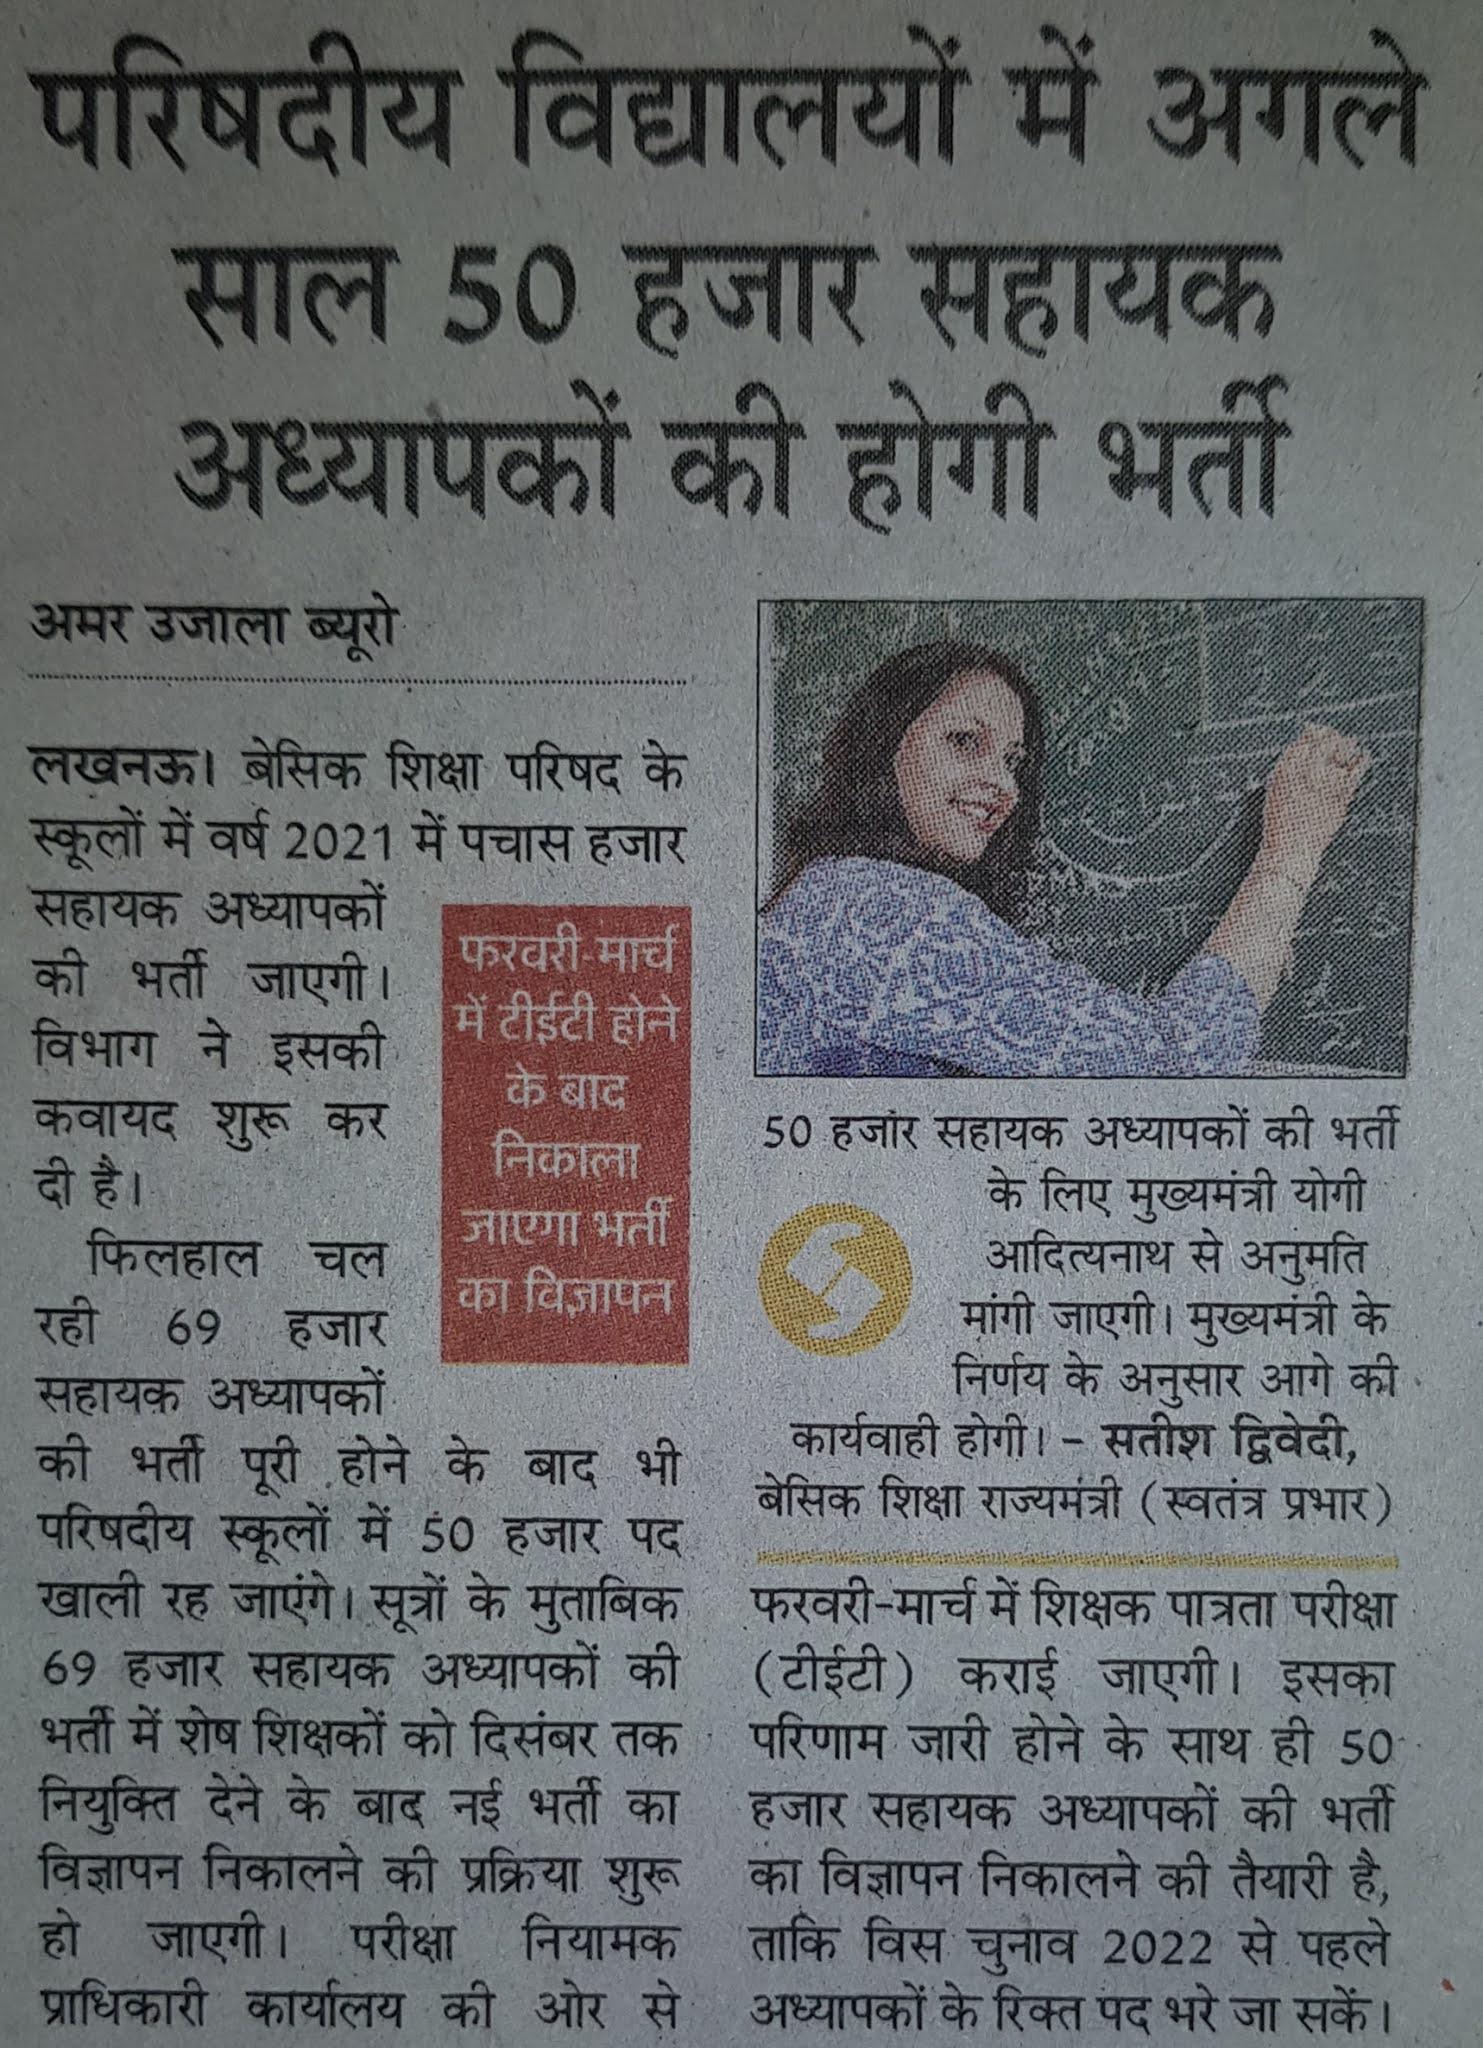 UP Assistant Teacher Vacancy 2021, Sahayak Adhyapak 50000 Bharti